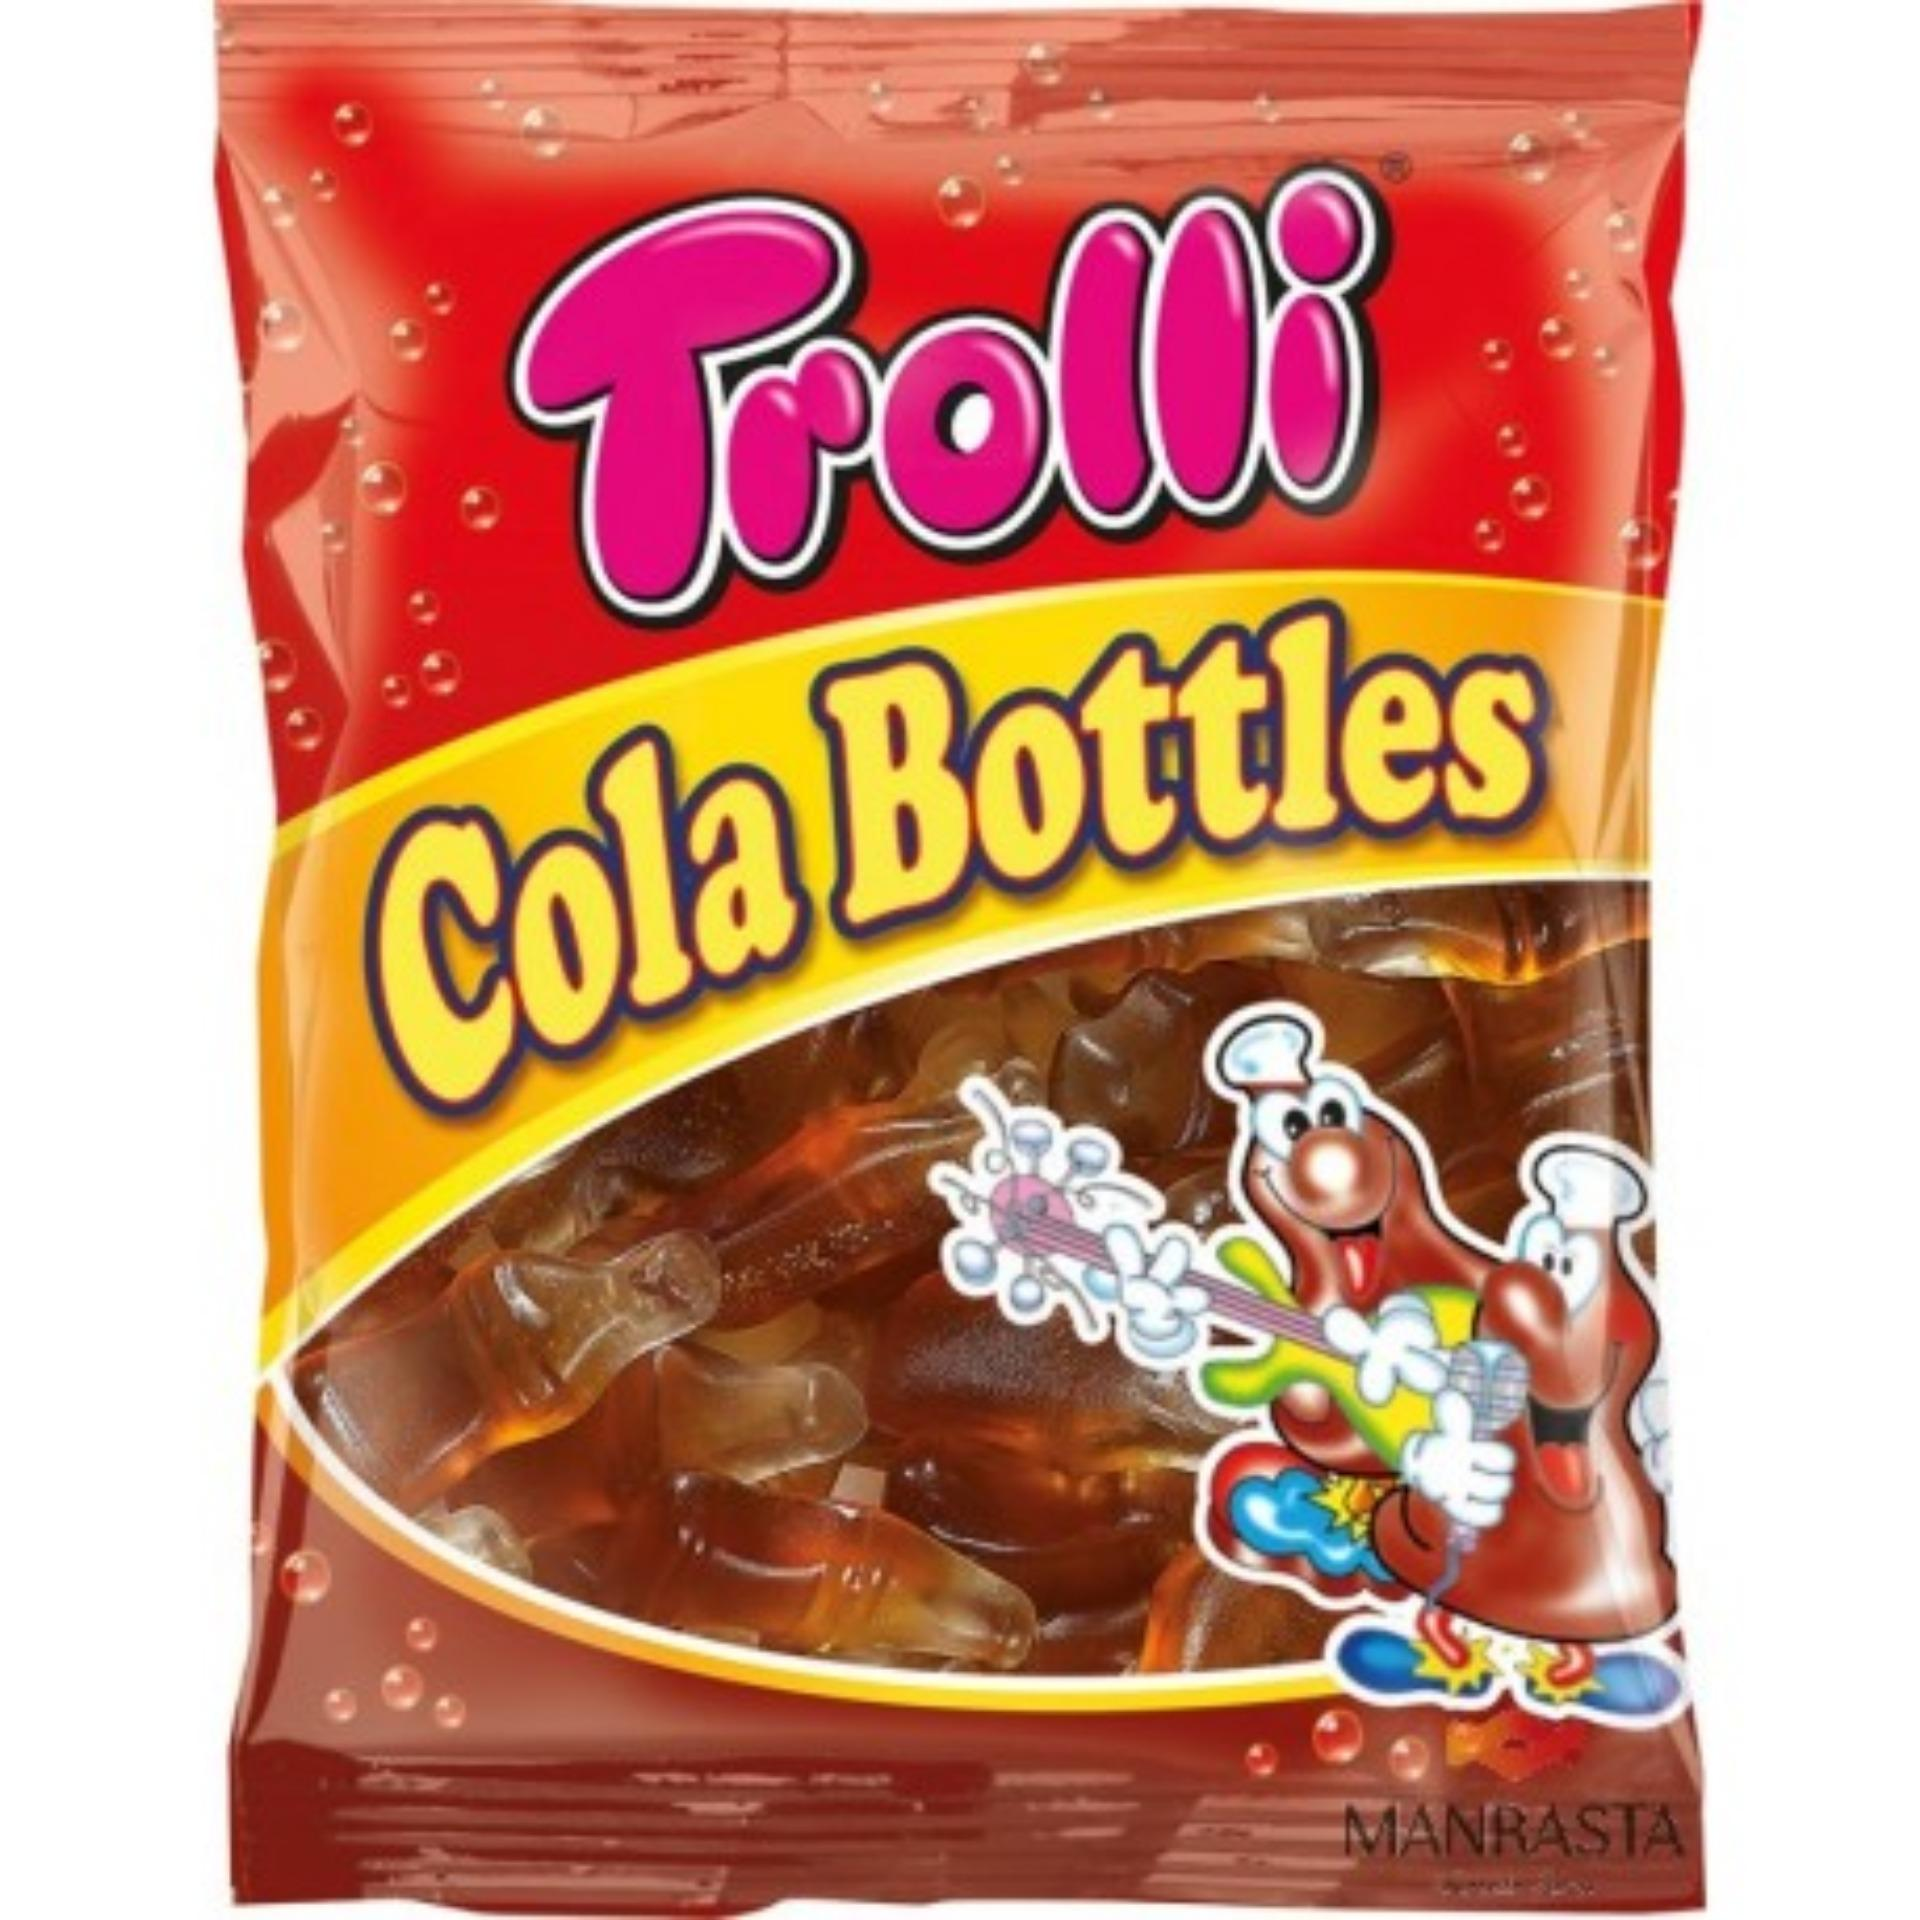 Kẹo dẻo Trolli Cola Bottles